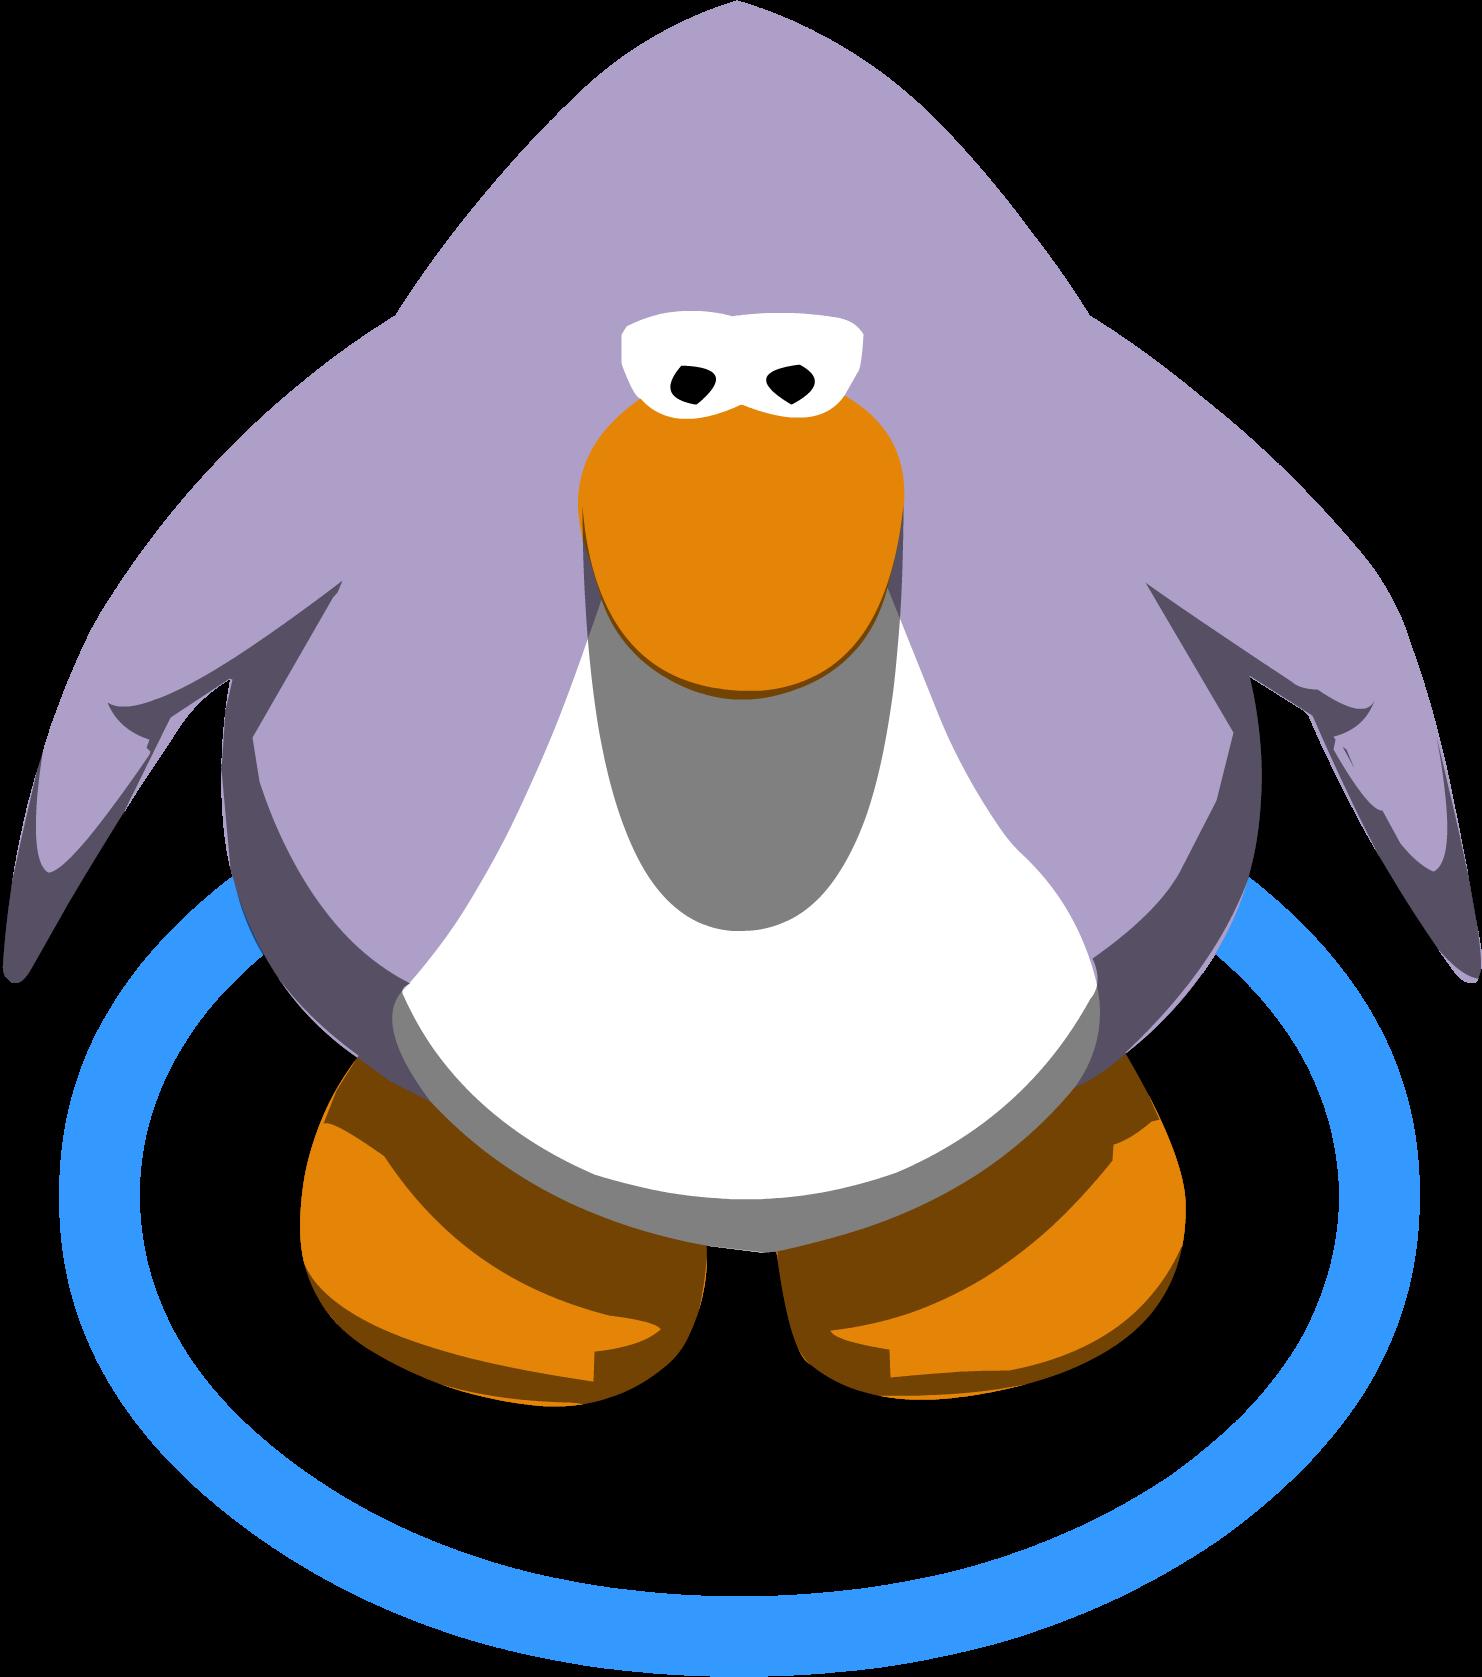 Lavandar penguin